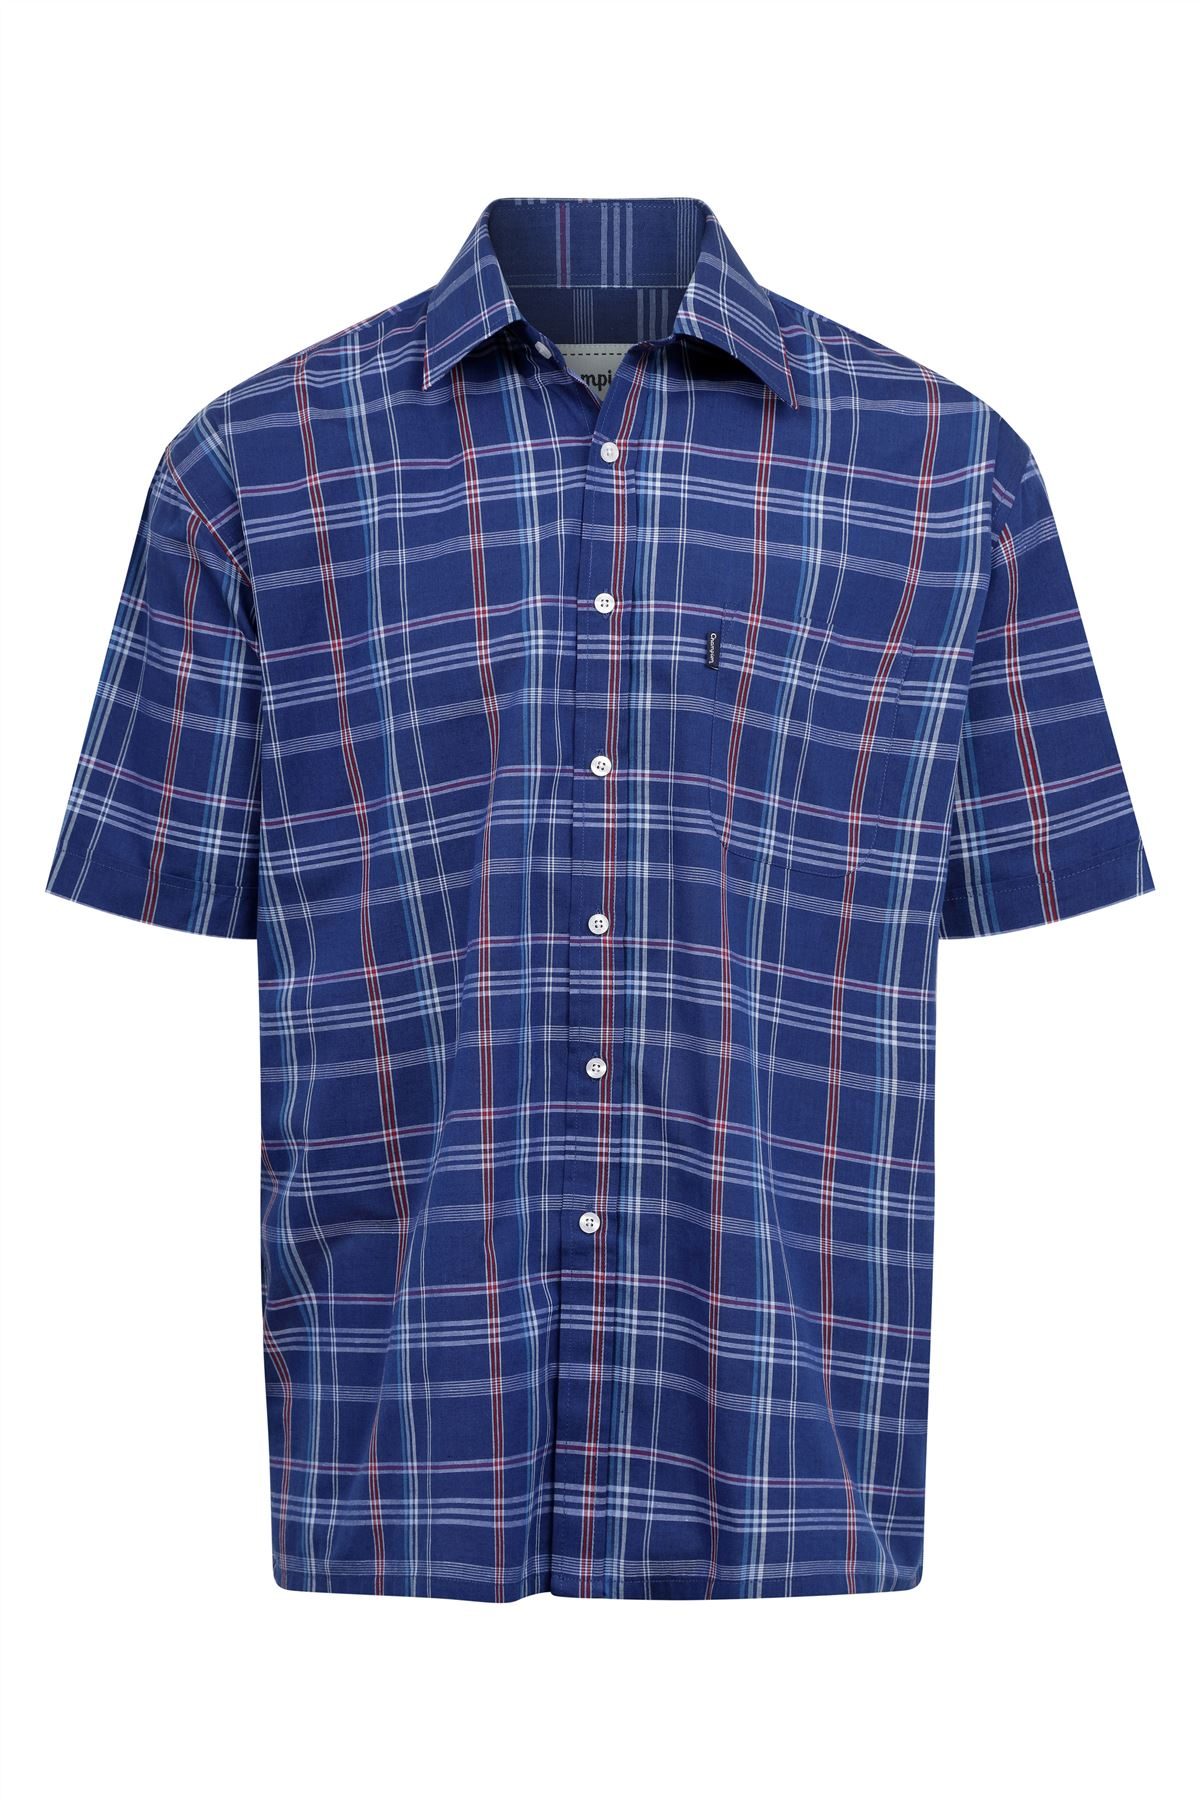 Champion-Mens-Shirt-Check-Short-Sleeve-Polycotton-Country-Casual thumbnail 7